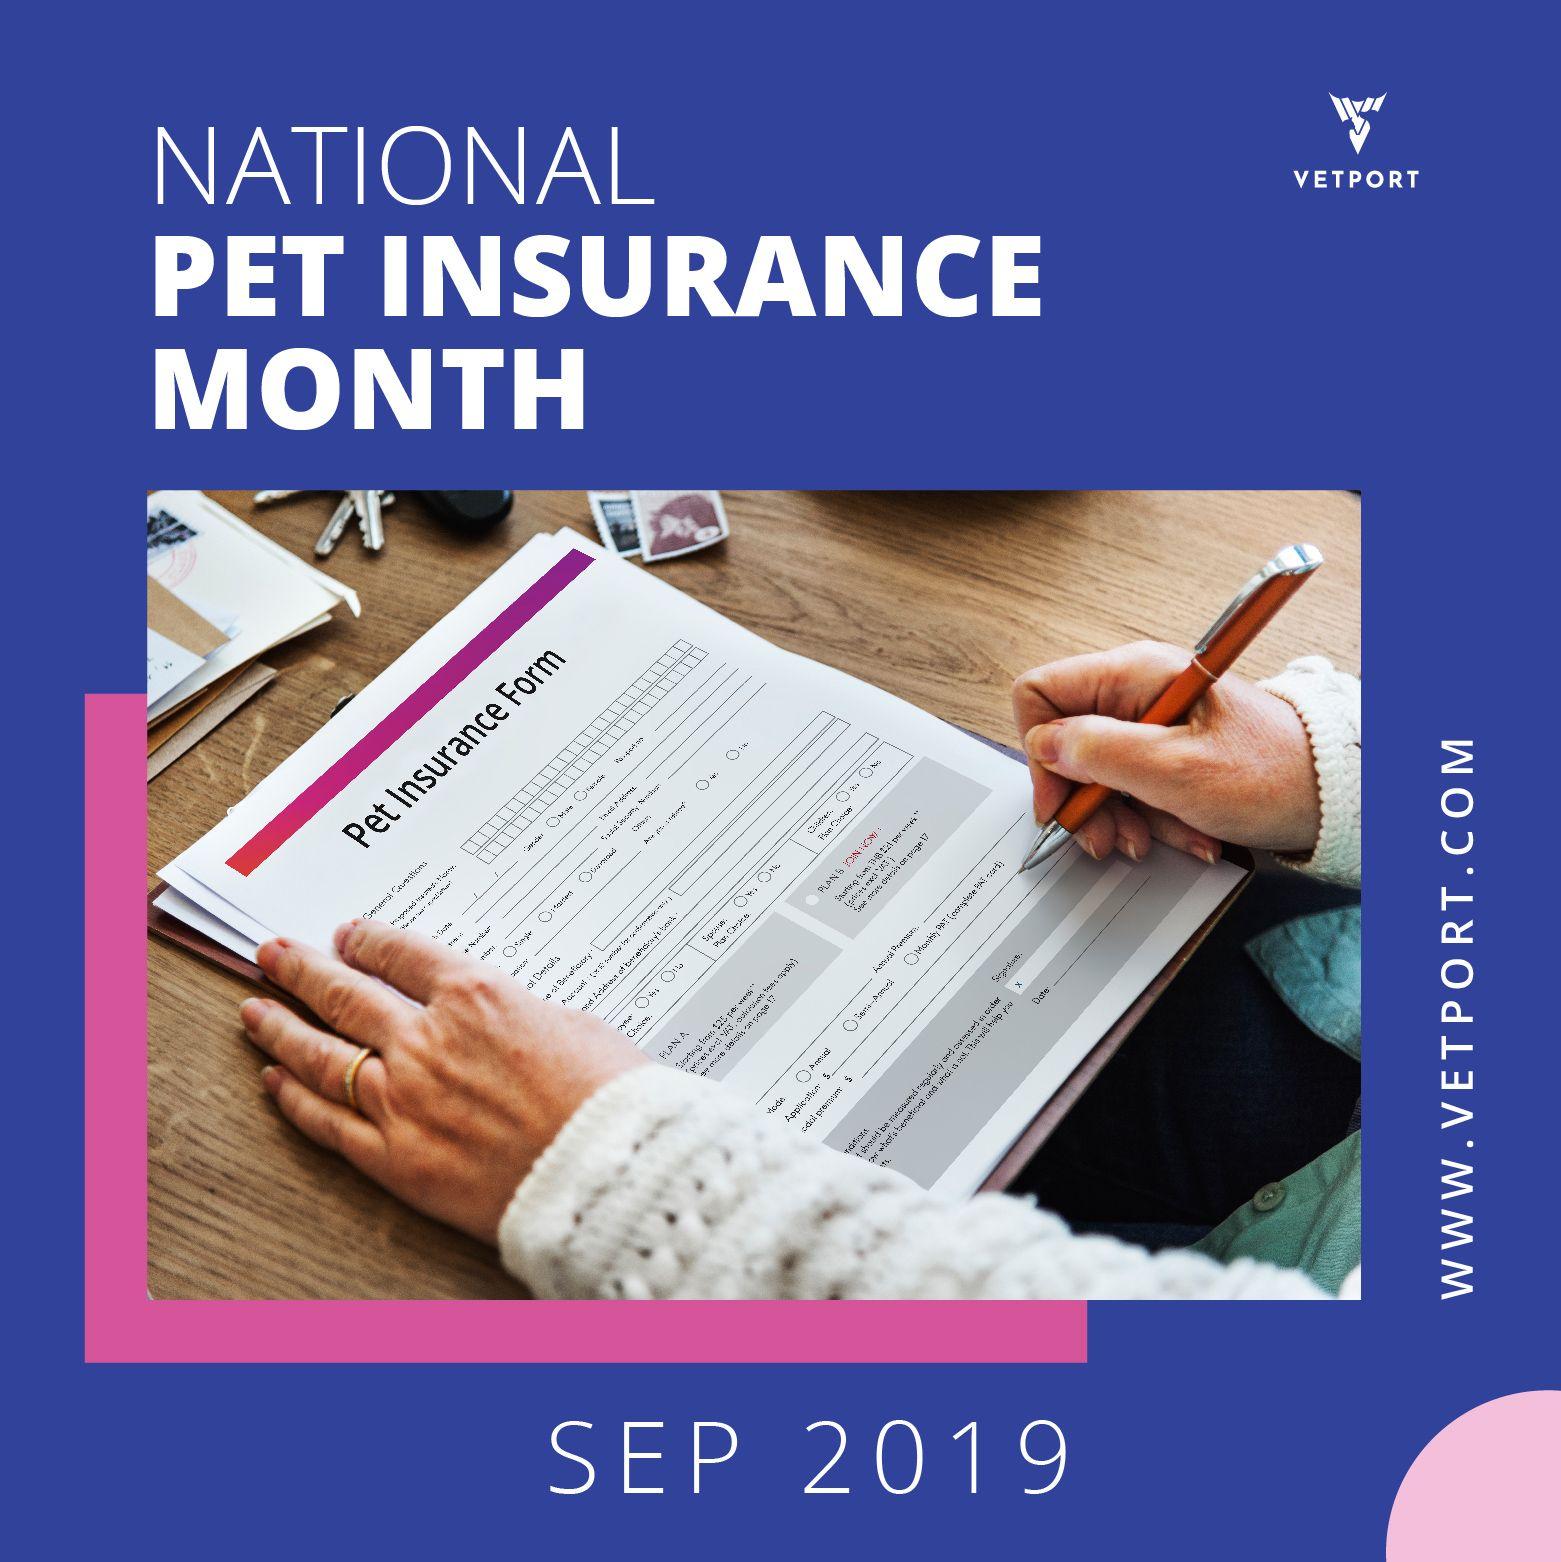 National Pet Insurance Month Pet insurance, Friday